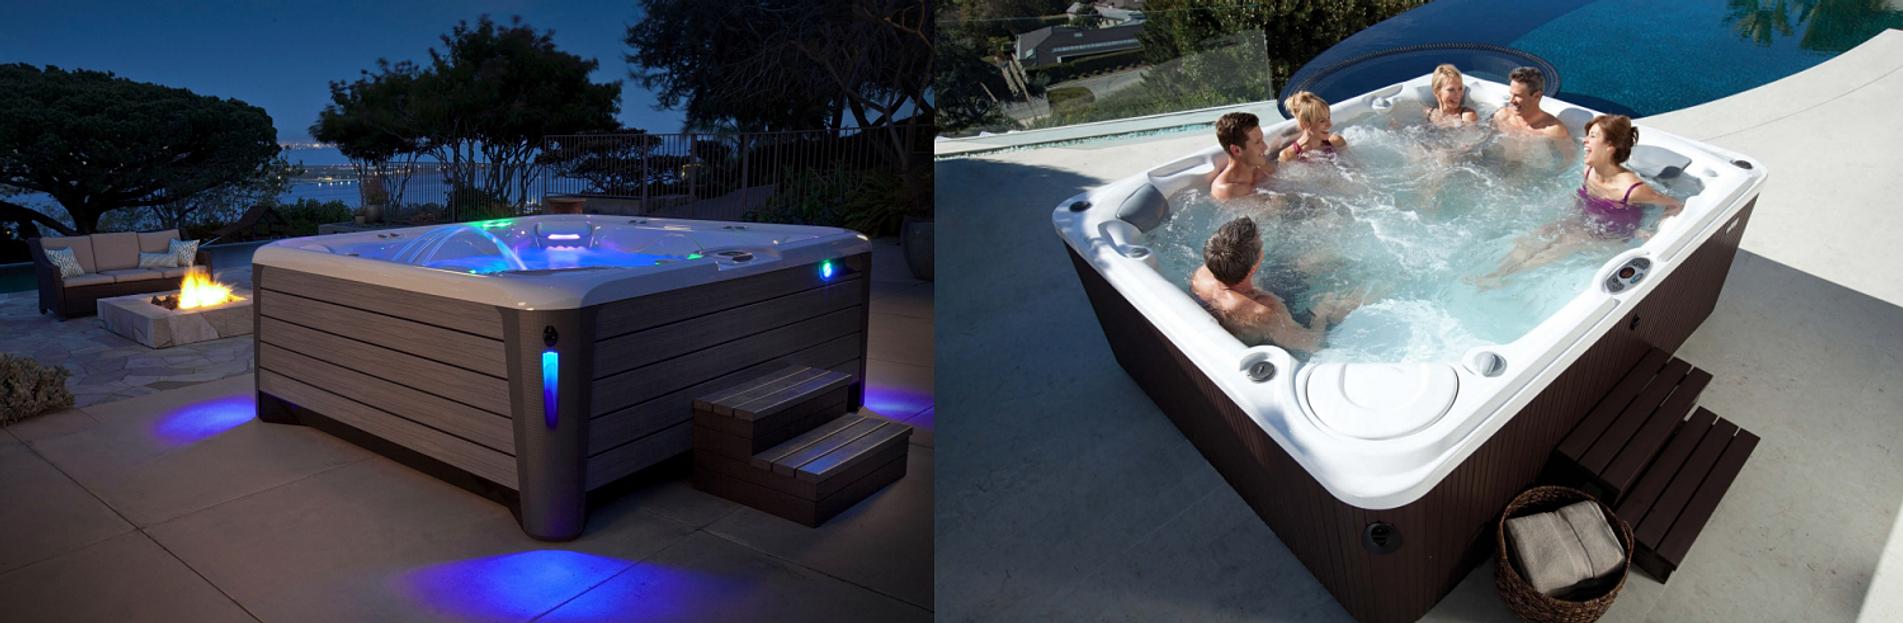 whirlpools von hot spring hotspring. Black Bedroom Furniture Sets. Home Design Ideas